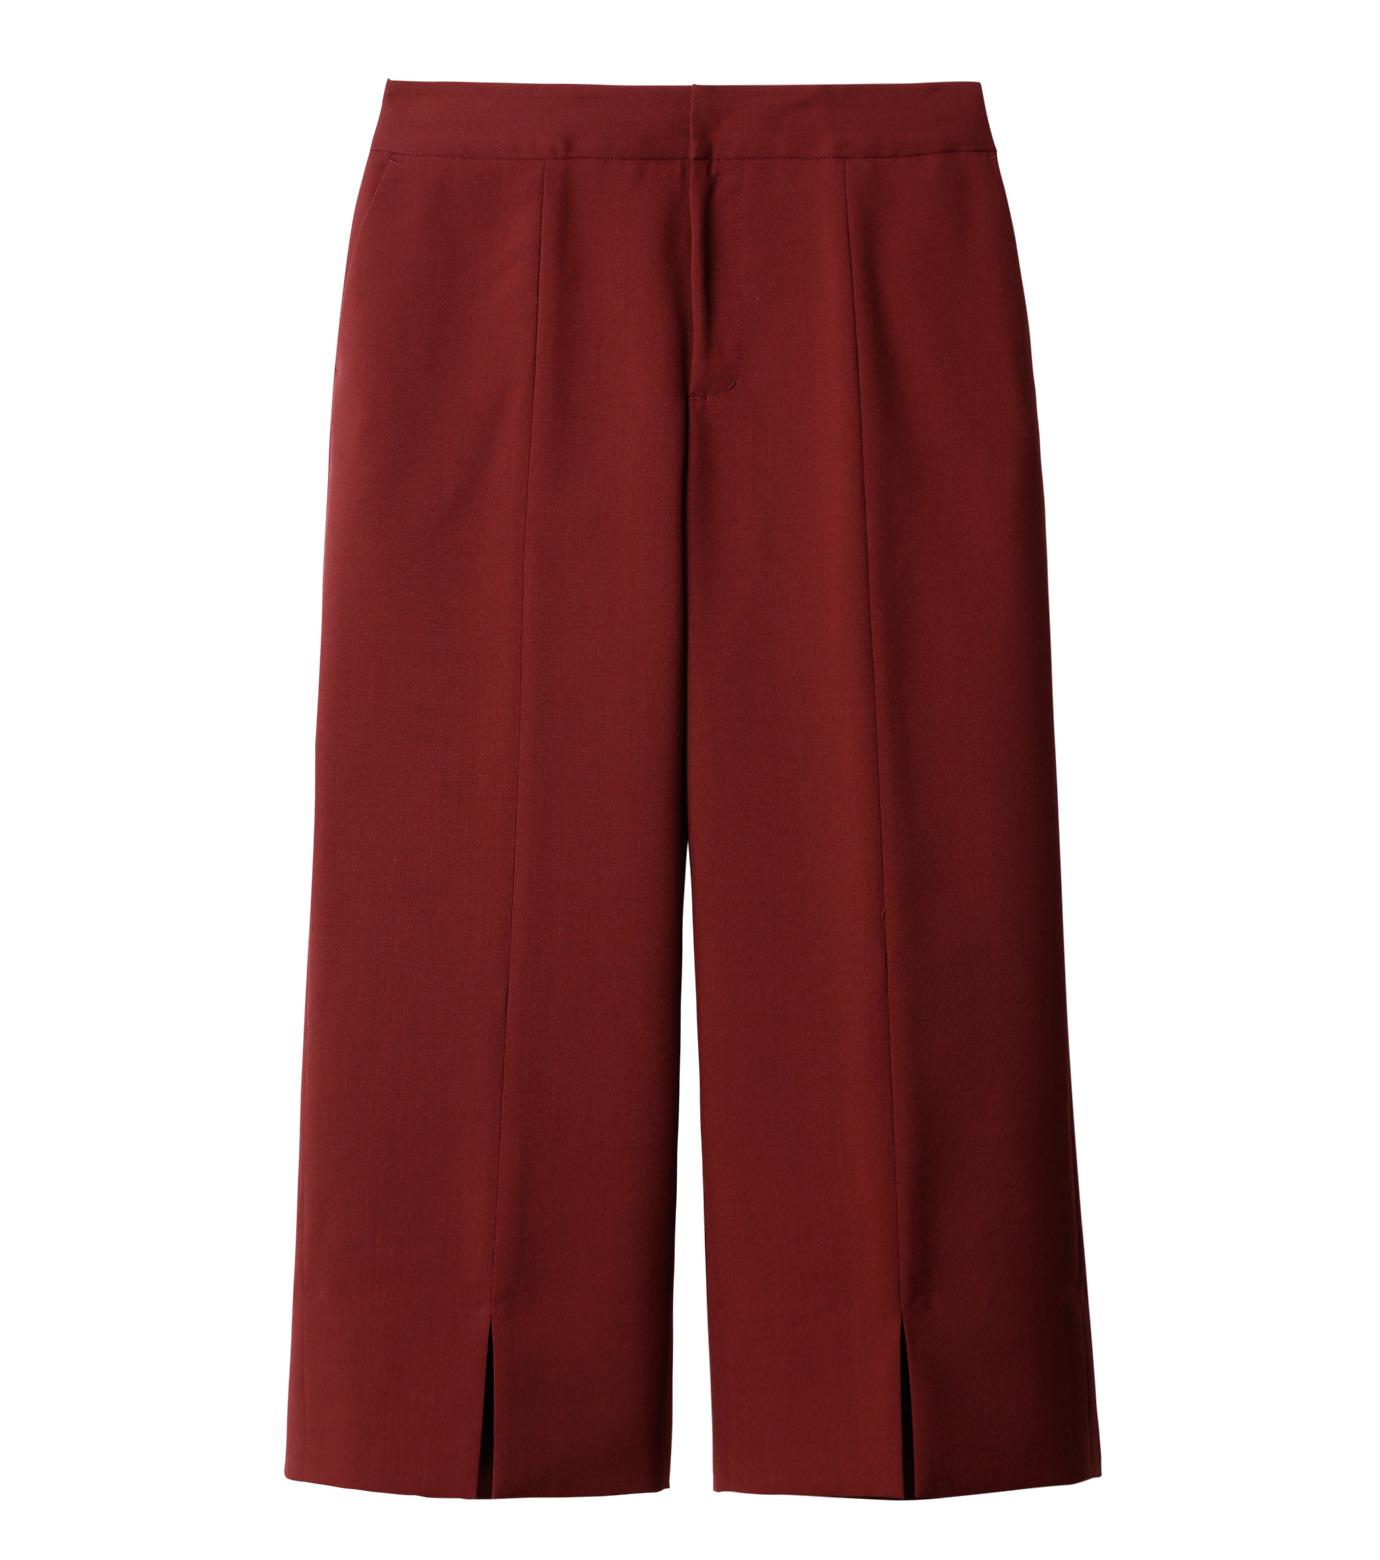 LE CIEL BLEU(ルシェルブルー)のサマーウールストレートパンツ-BORDEAUX(パンツ/pants)-18A68001 拡大詳細画像5